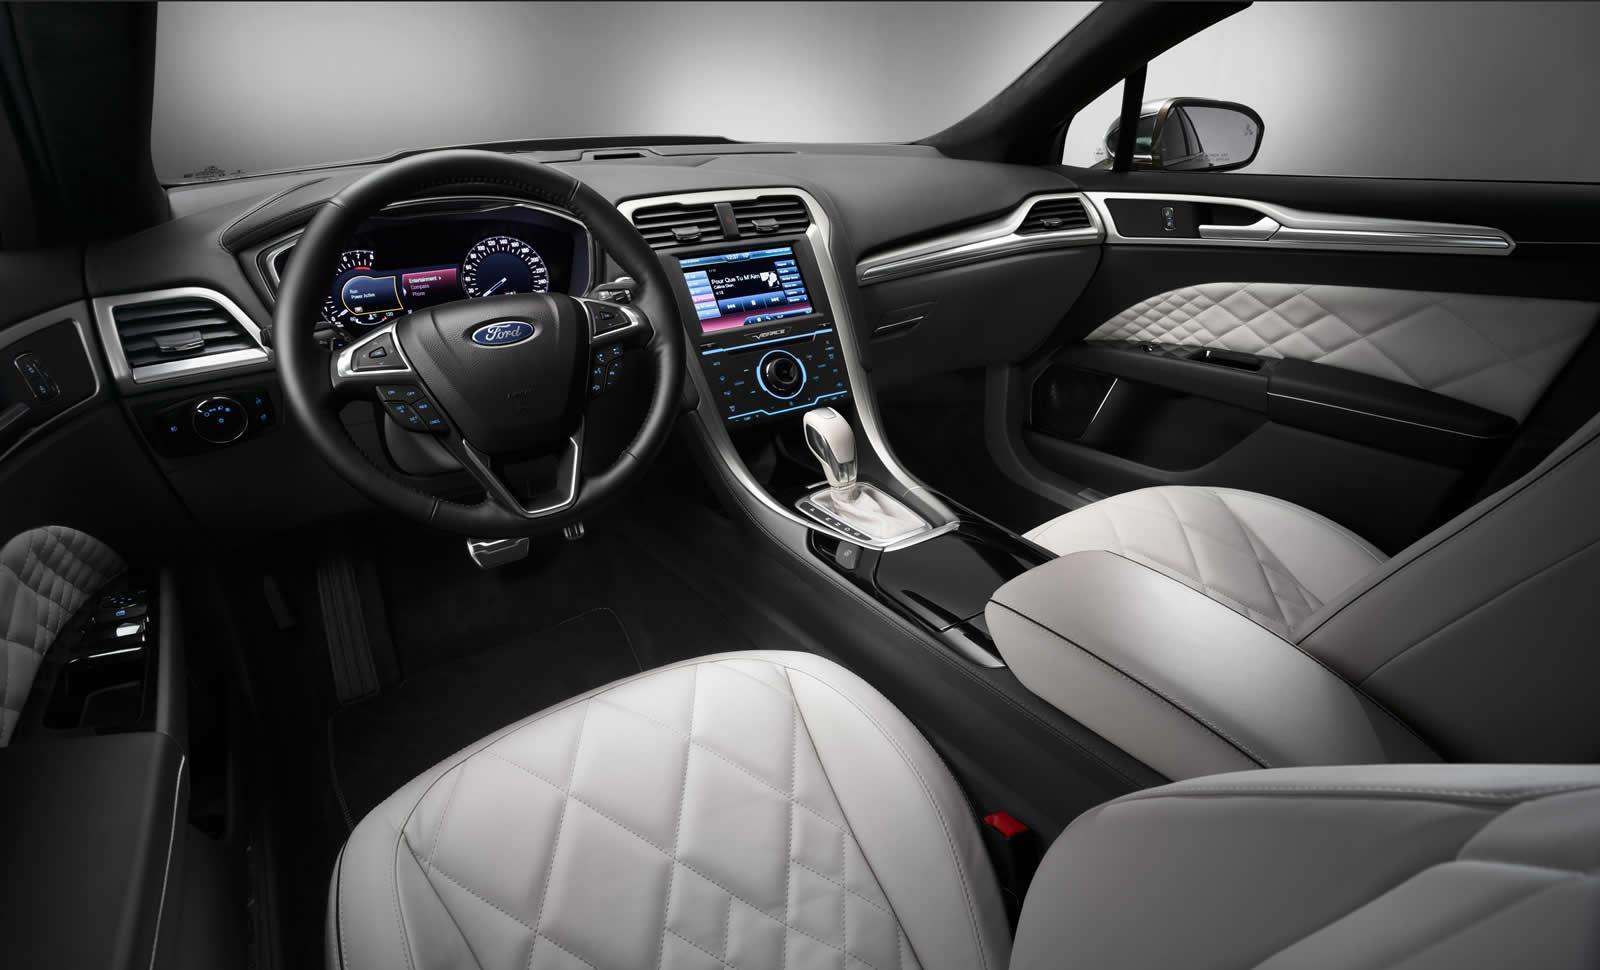 Interior-of-the-Ford-Mondeo-Vignale-Concept